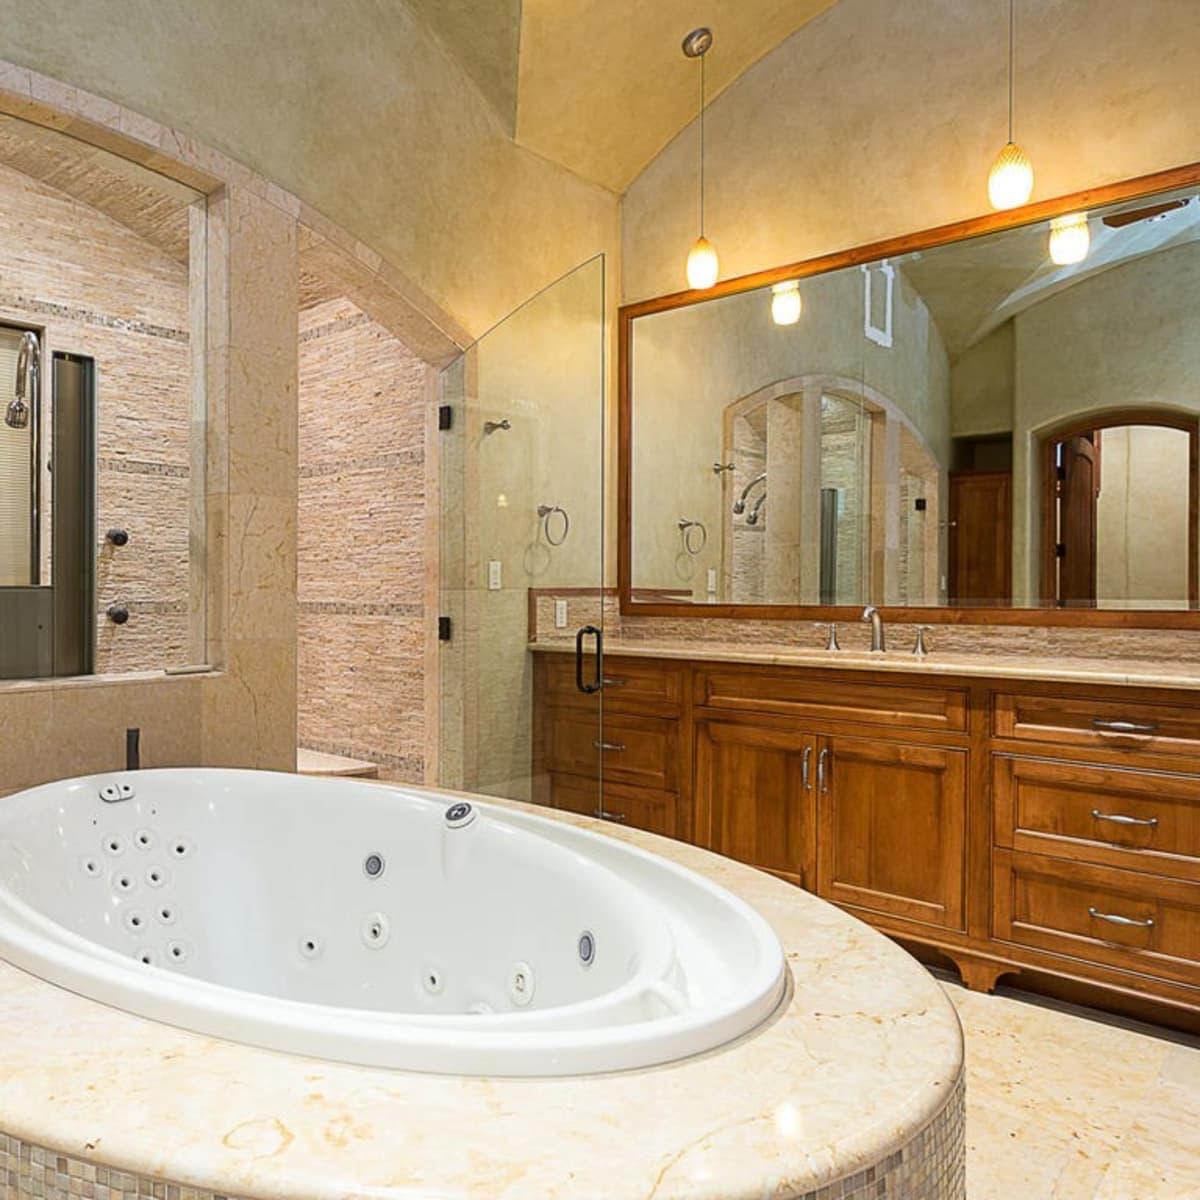 Austin home house 12006 Pleasant Panorama View 78738 Jeff Kent April 2016 master bathroom